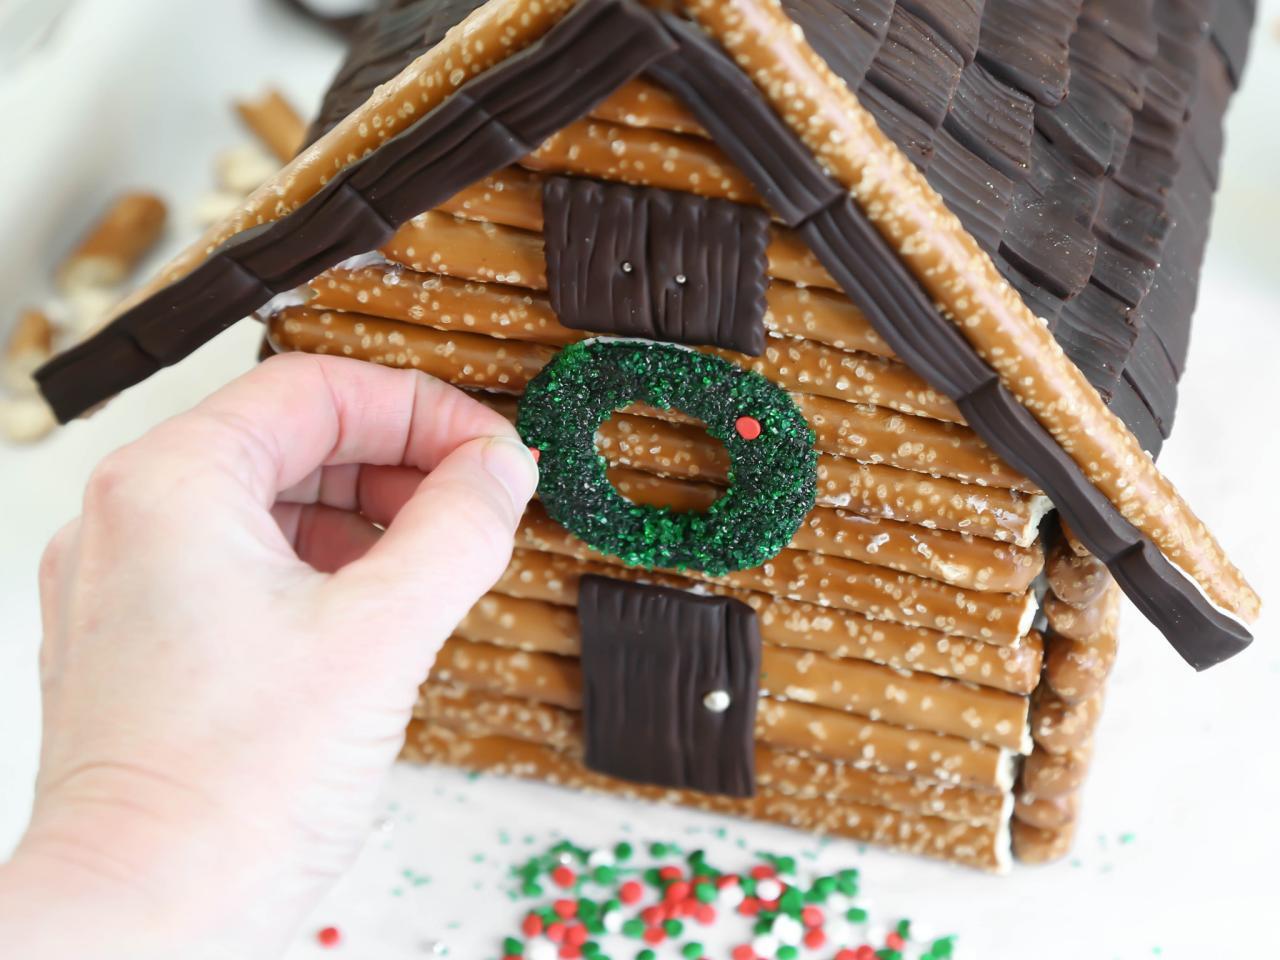 Make an edible snow globe for the holidays hgtv 39 s decorating design blog hgtv - Make a house a home ...